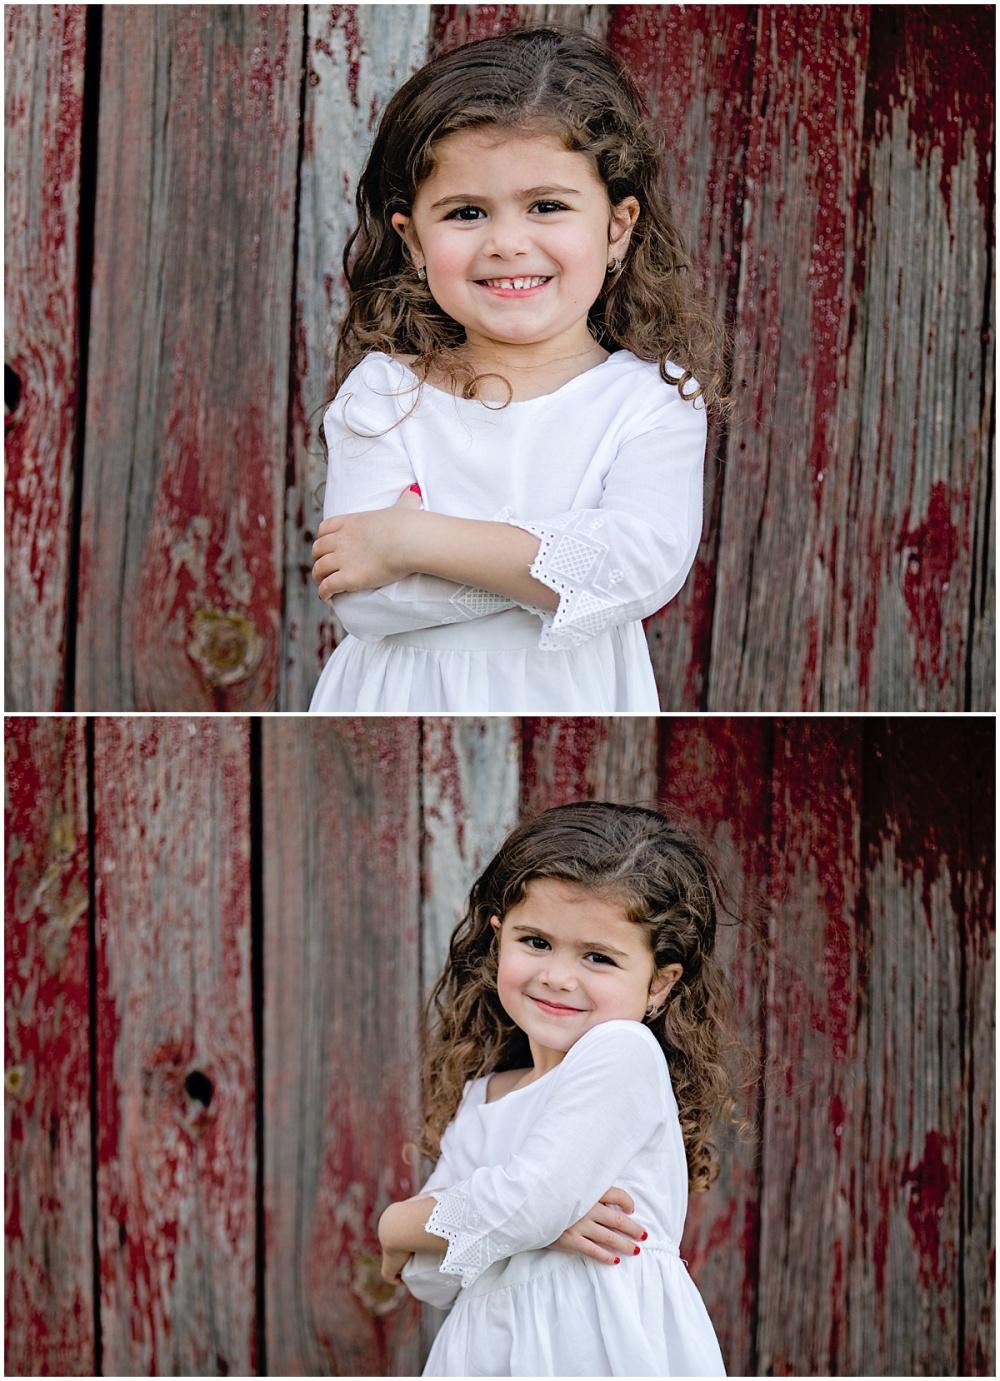 Wildflowers-Texas-Bluebonnets-Spring-Birthday-Photo-Session-Kids-Carly-Barton-Photography_0003.jpg